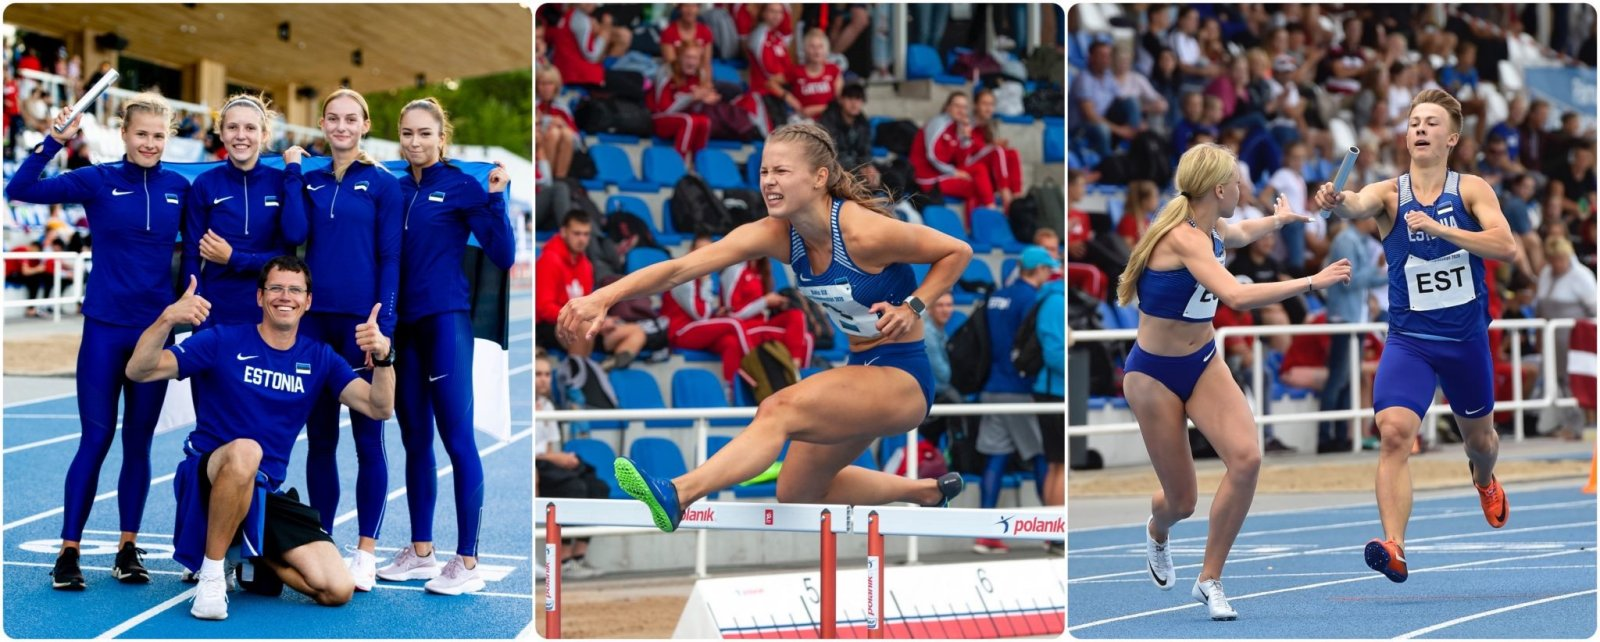 Balti kergejõustiku meistrivõistlustel sündis kolm noorteklassi rekordit: